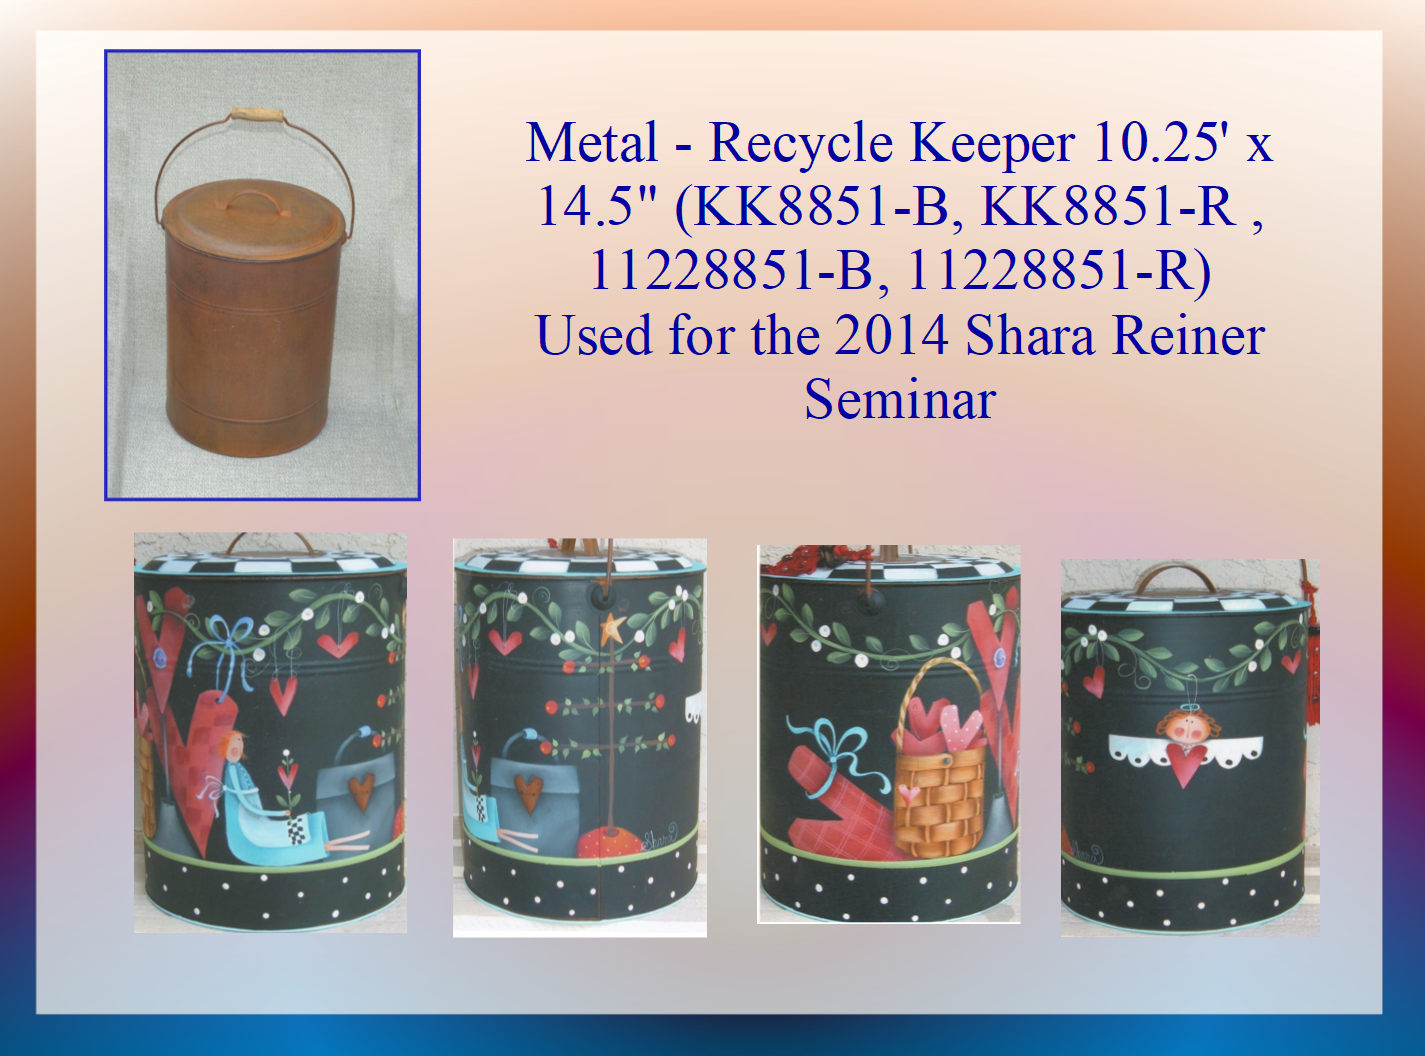 metal-recycle-container-shara-reiner-2014.jpg